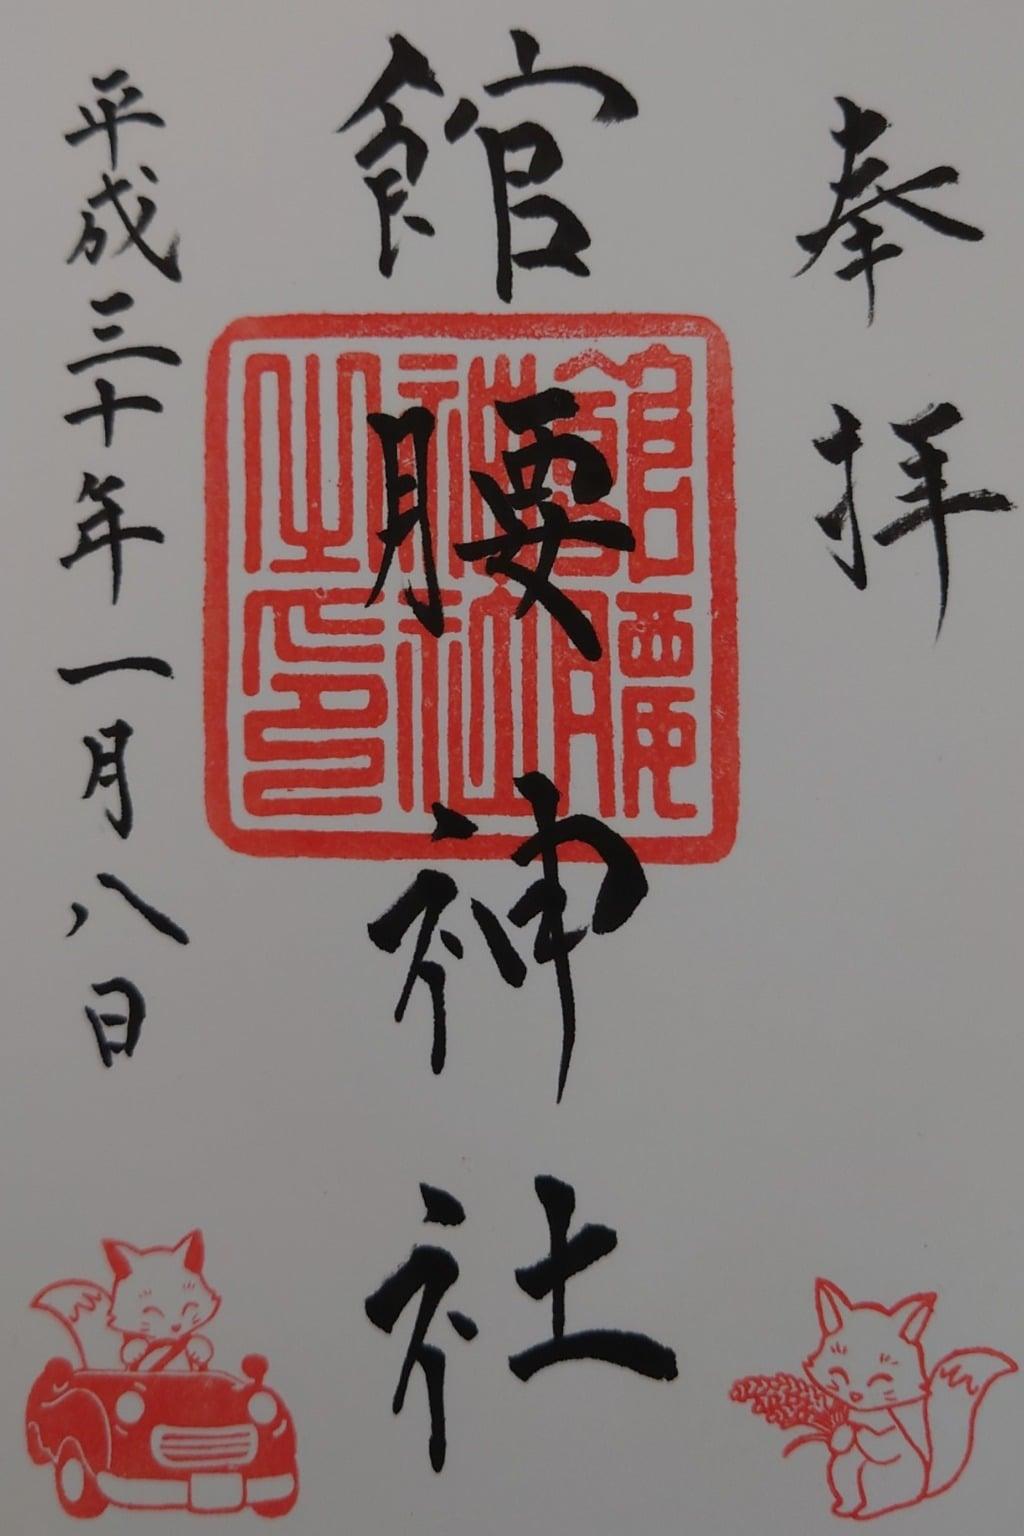 館腰神社の御朱印